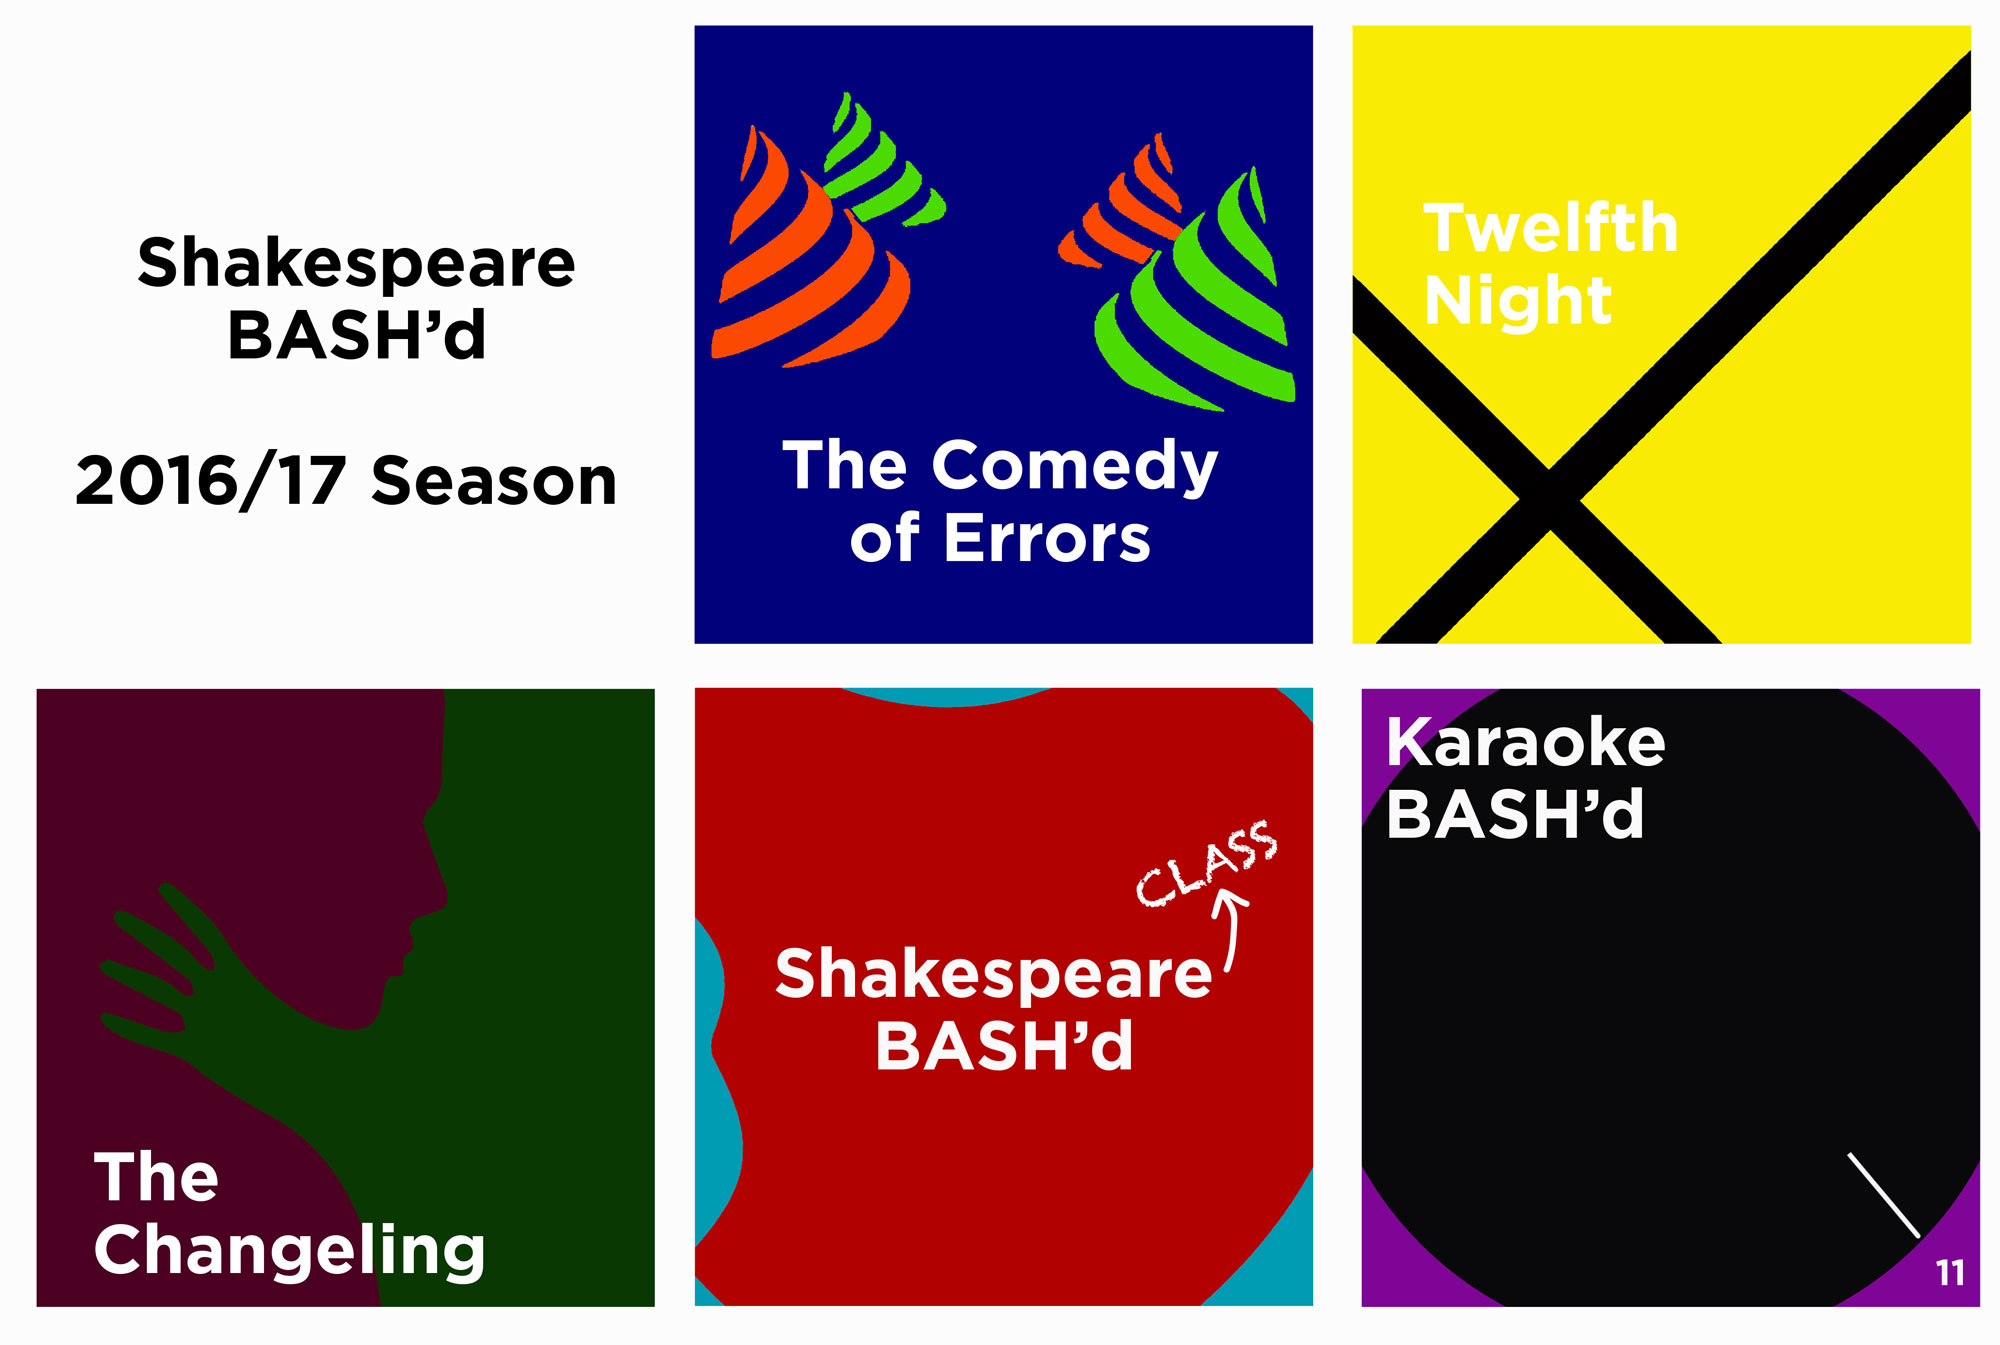 shakespeare-bashd-2016-season-kyle-purcell.jpg